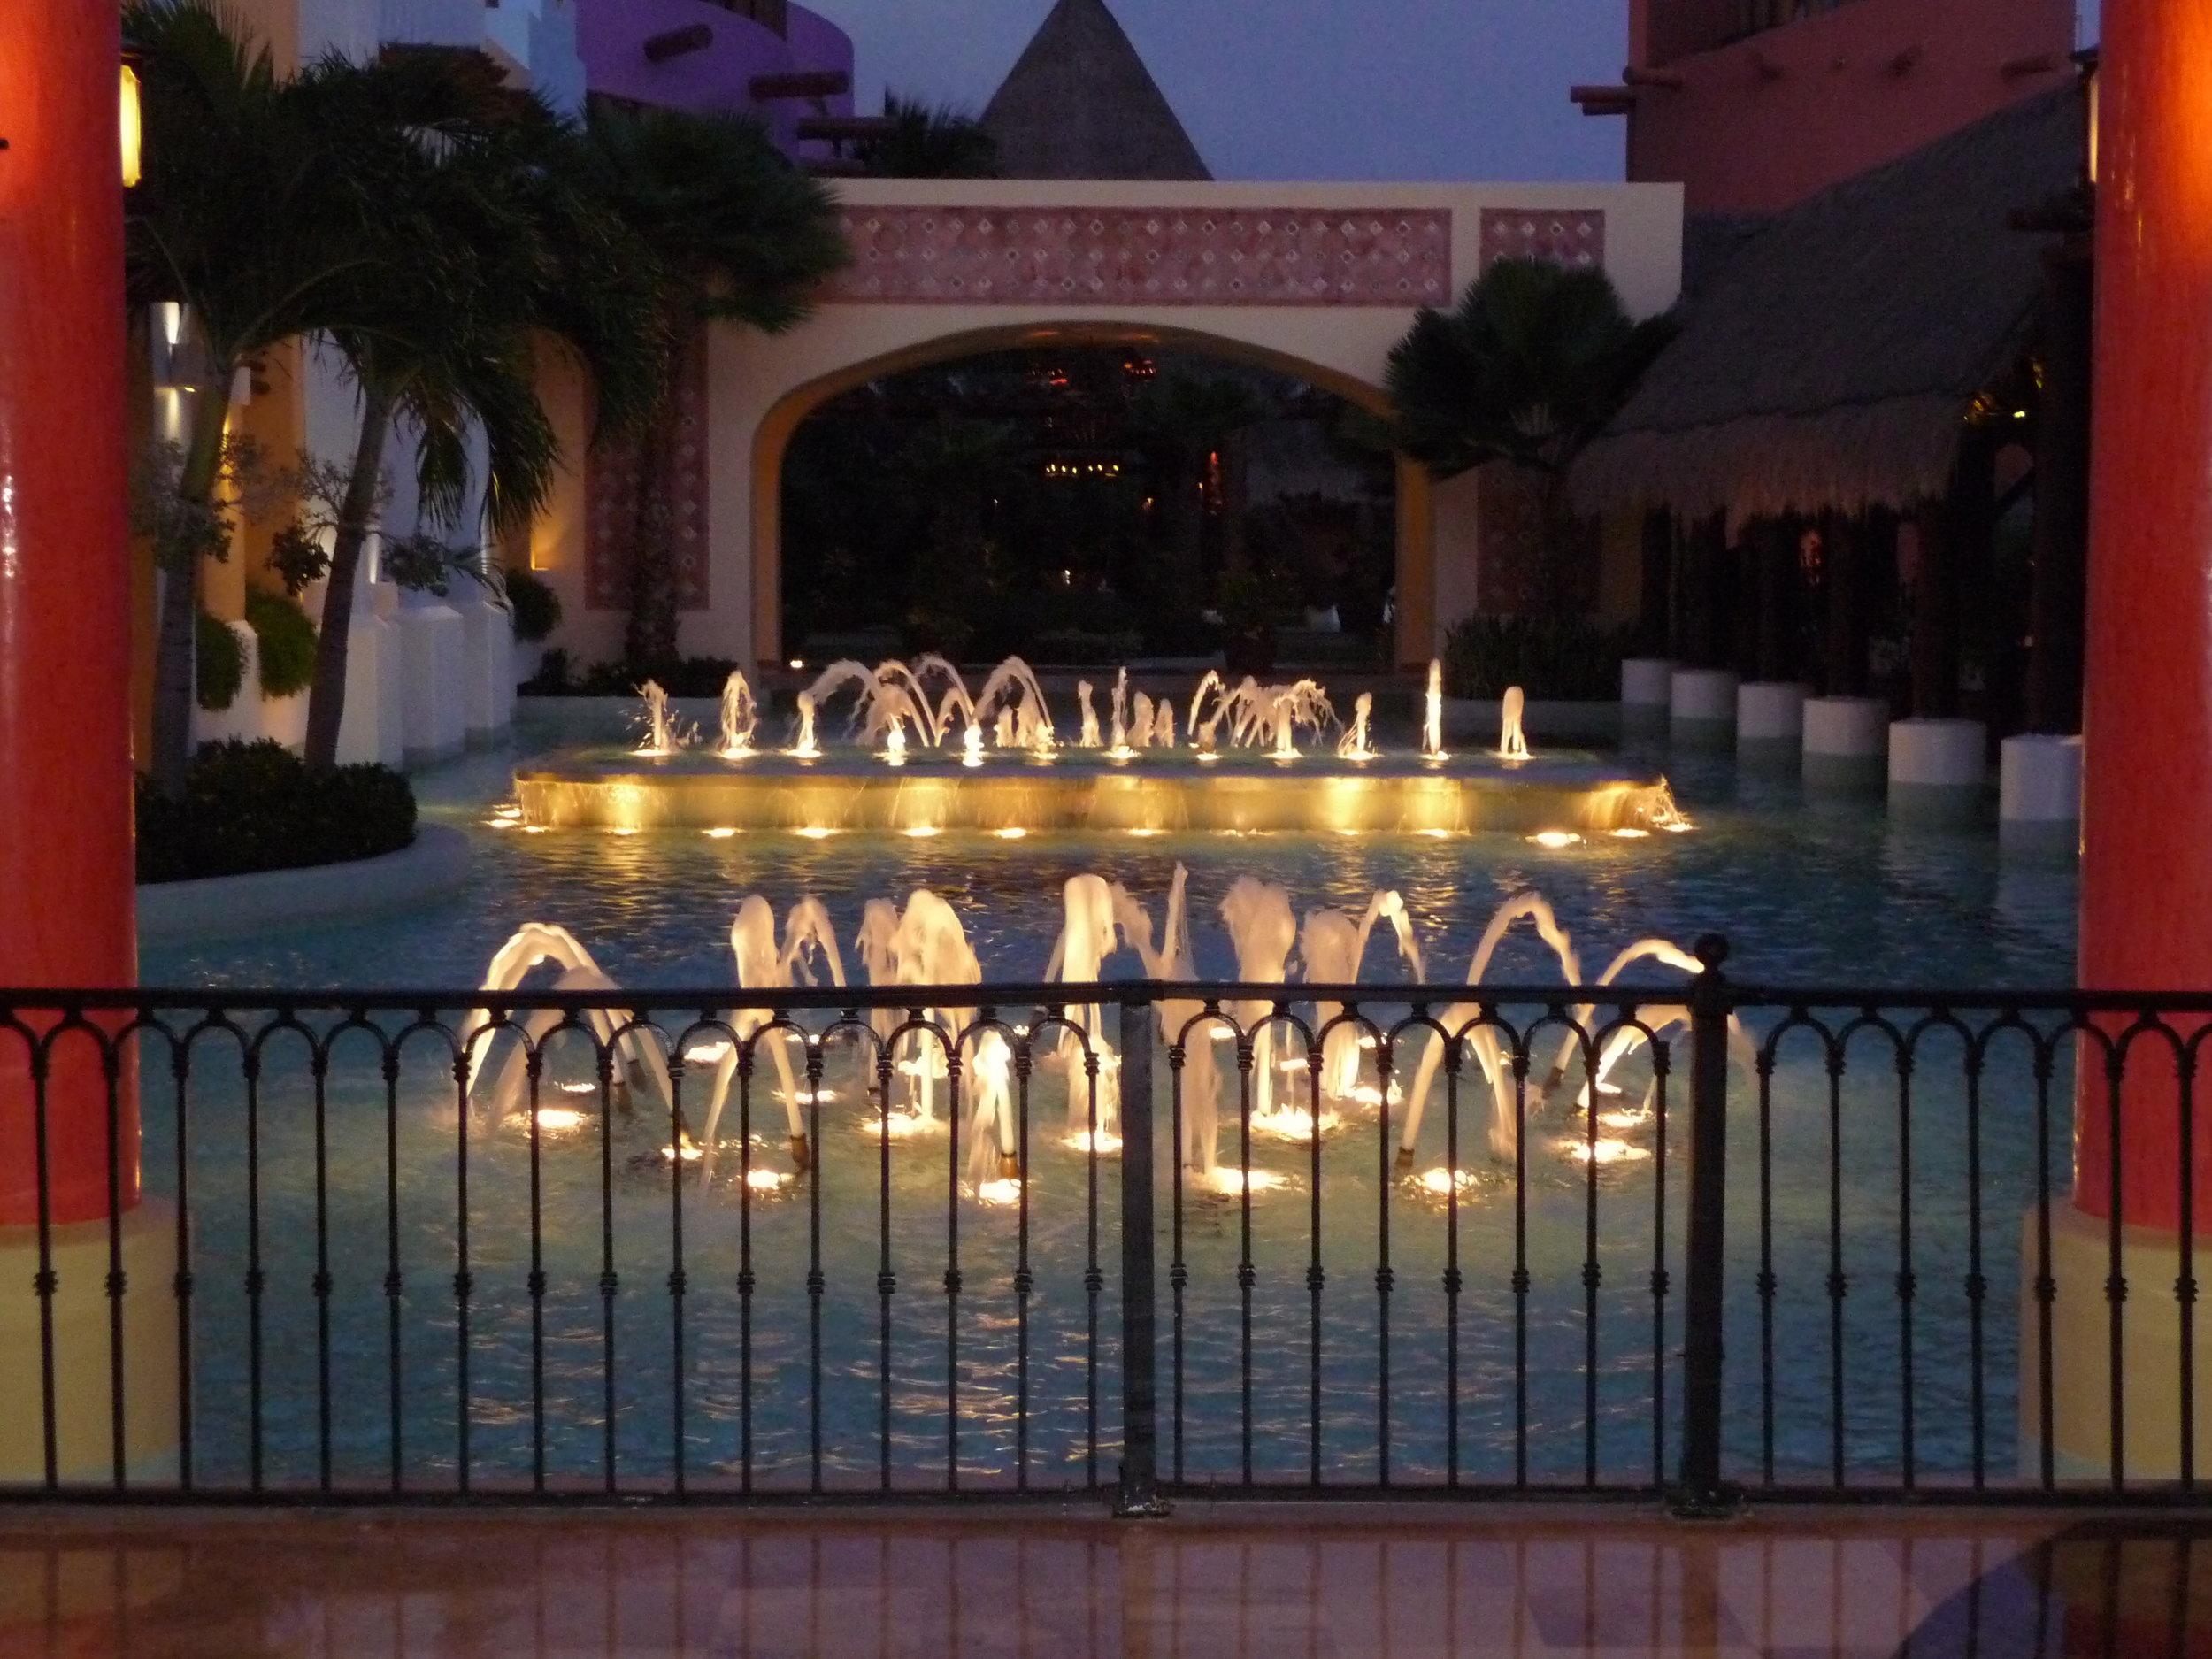 fountains-at-night.jpg